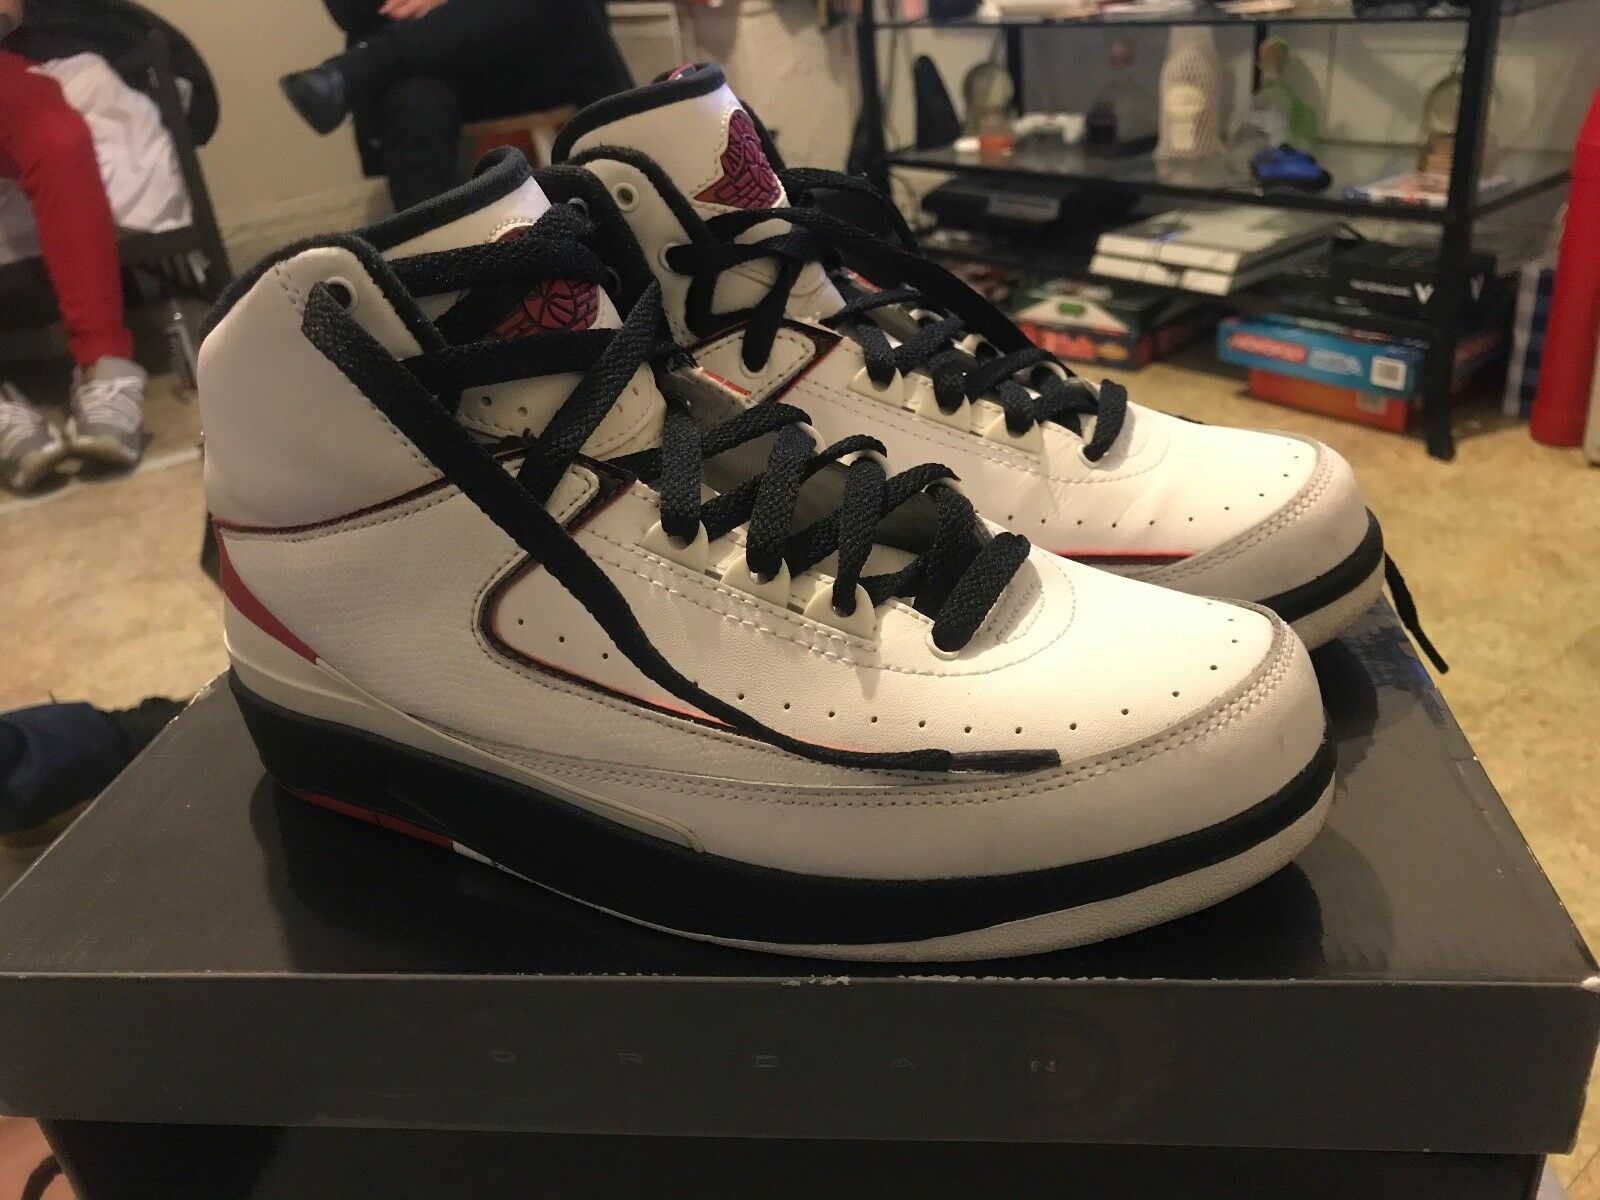 Nike Air Jordan Retro 2 Bred Brand New DS Size 7